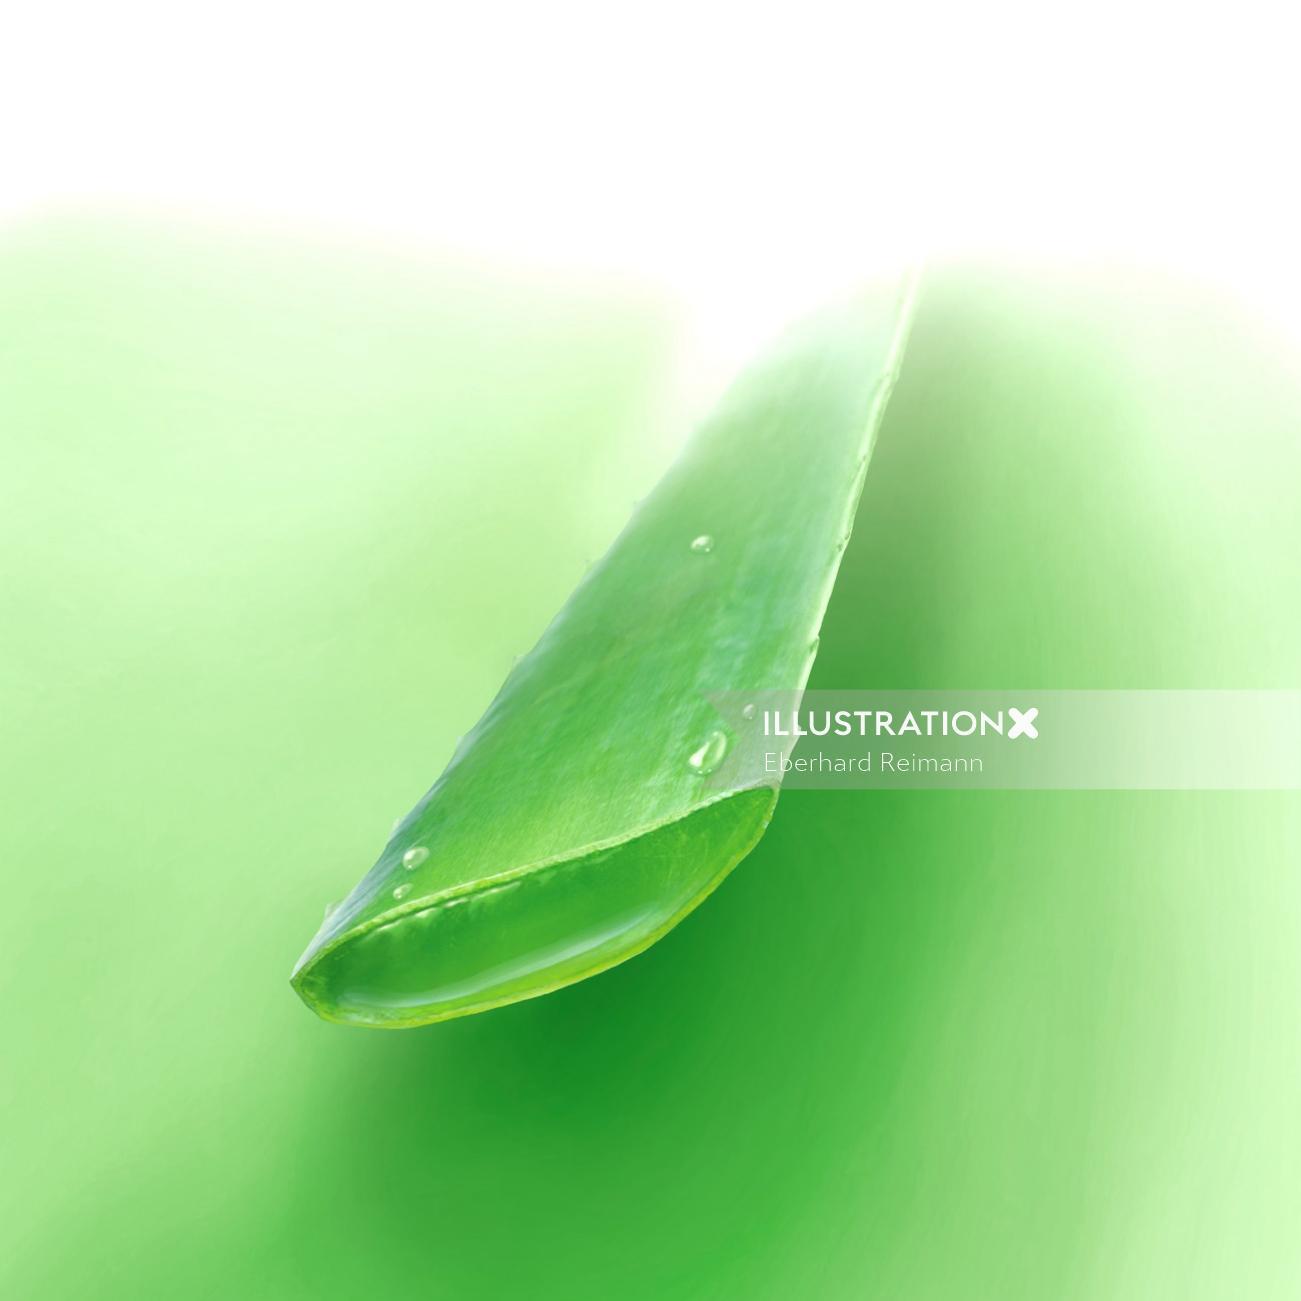 Aloe vera sliced design